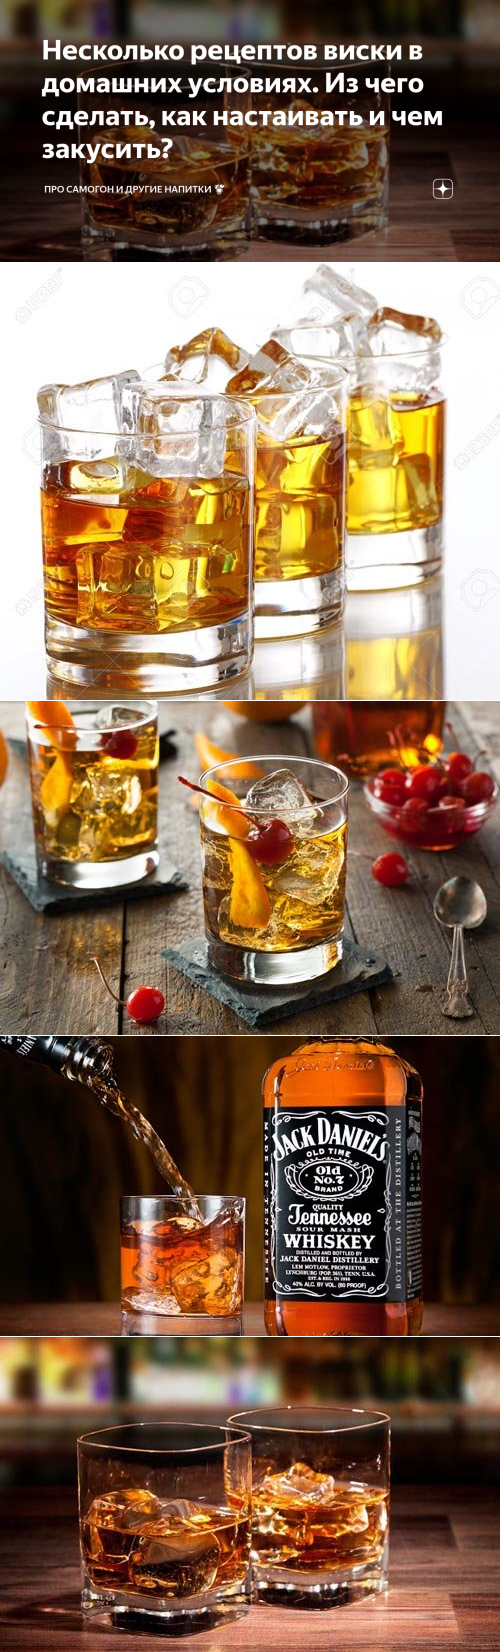 Делаем виски в домашних условиях – рецепт и технология